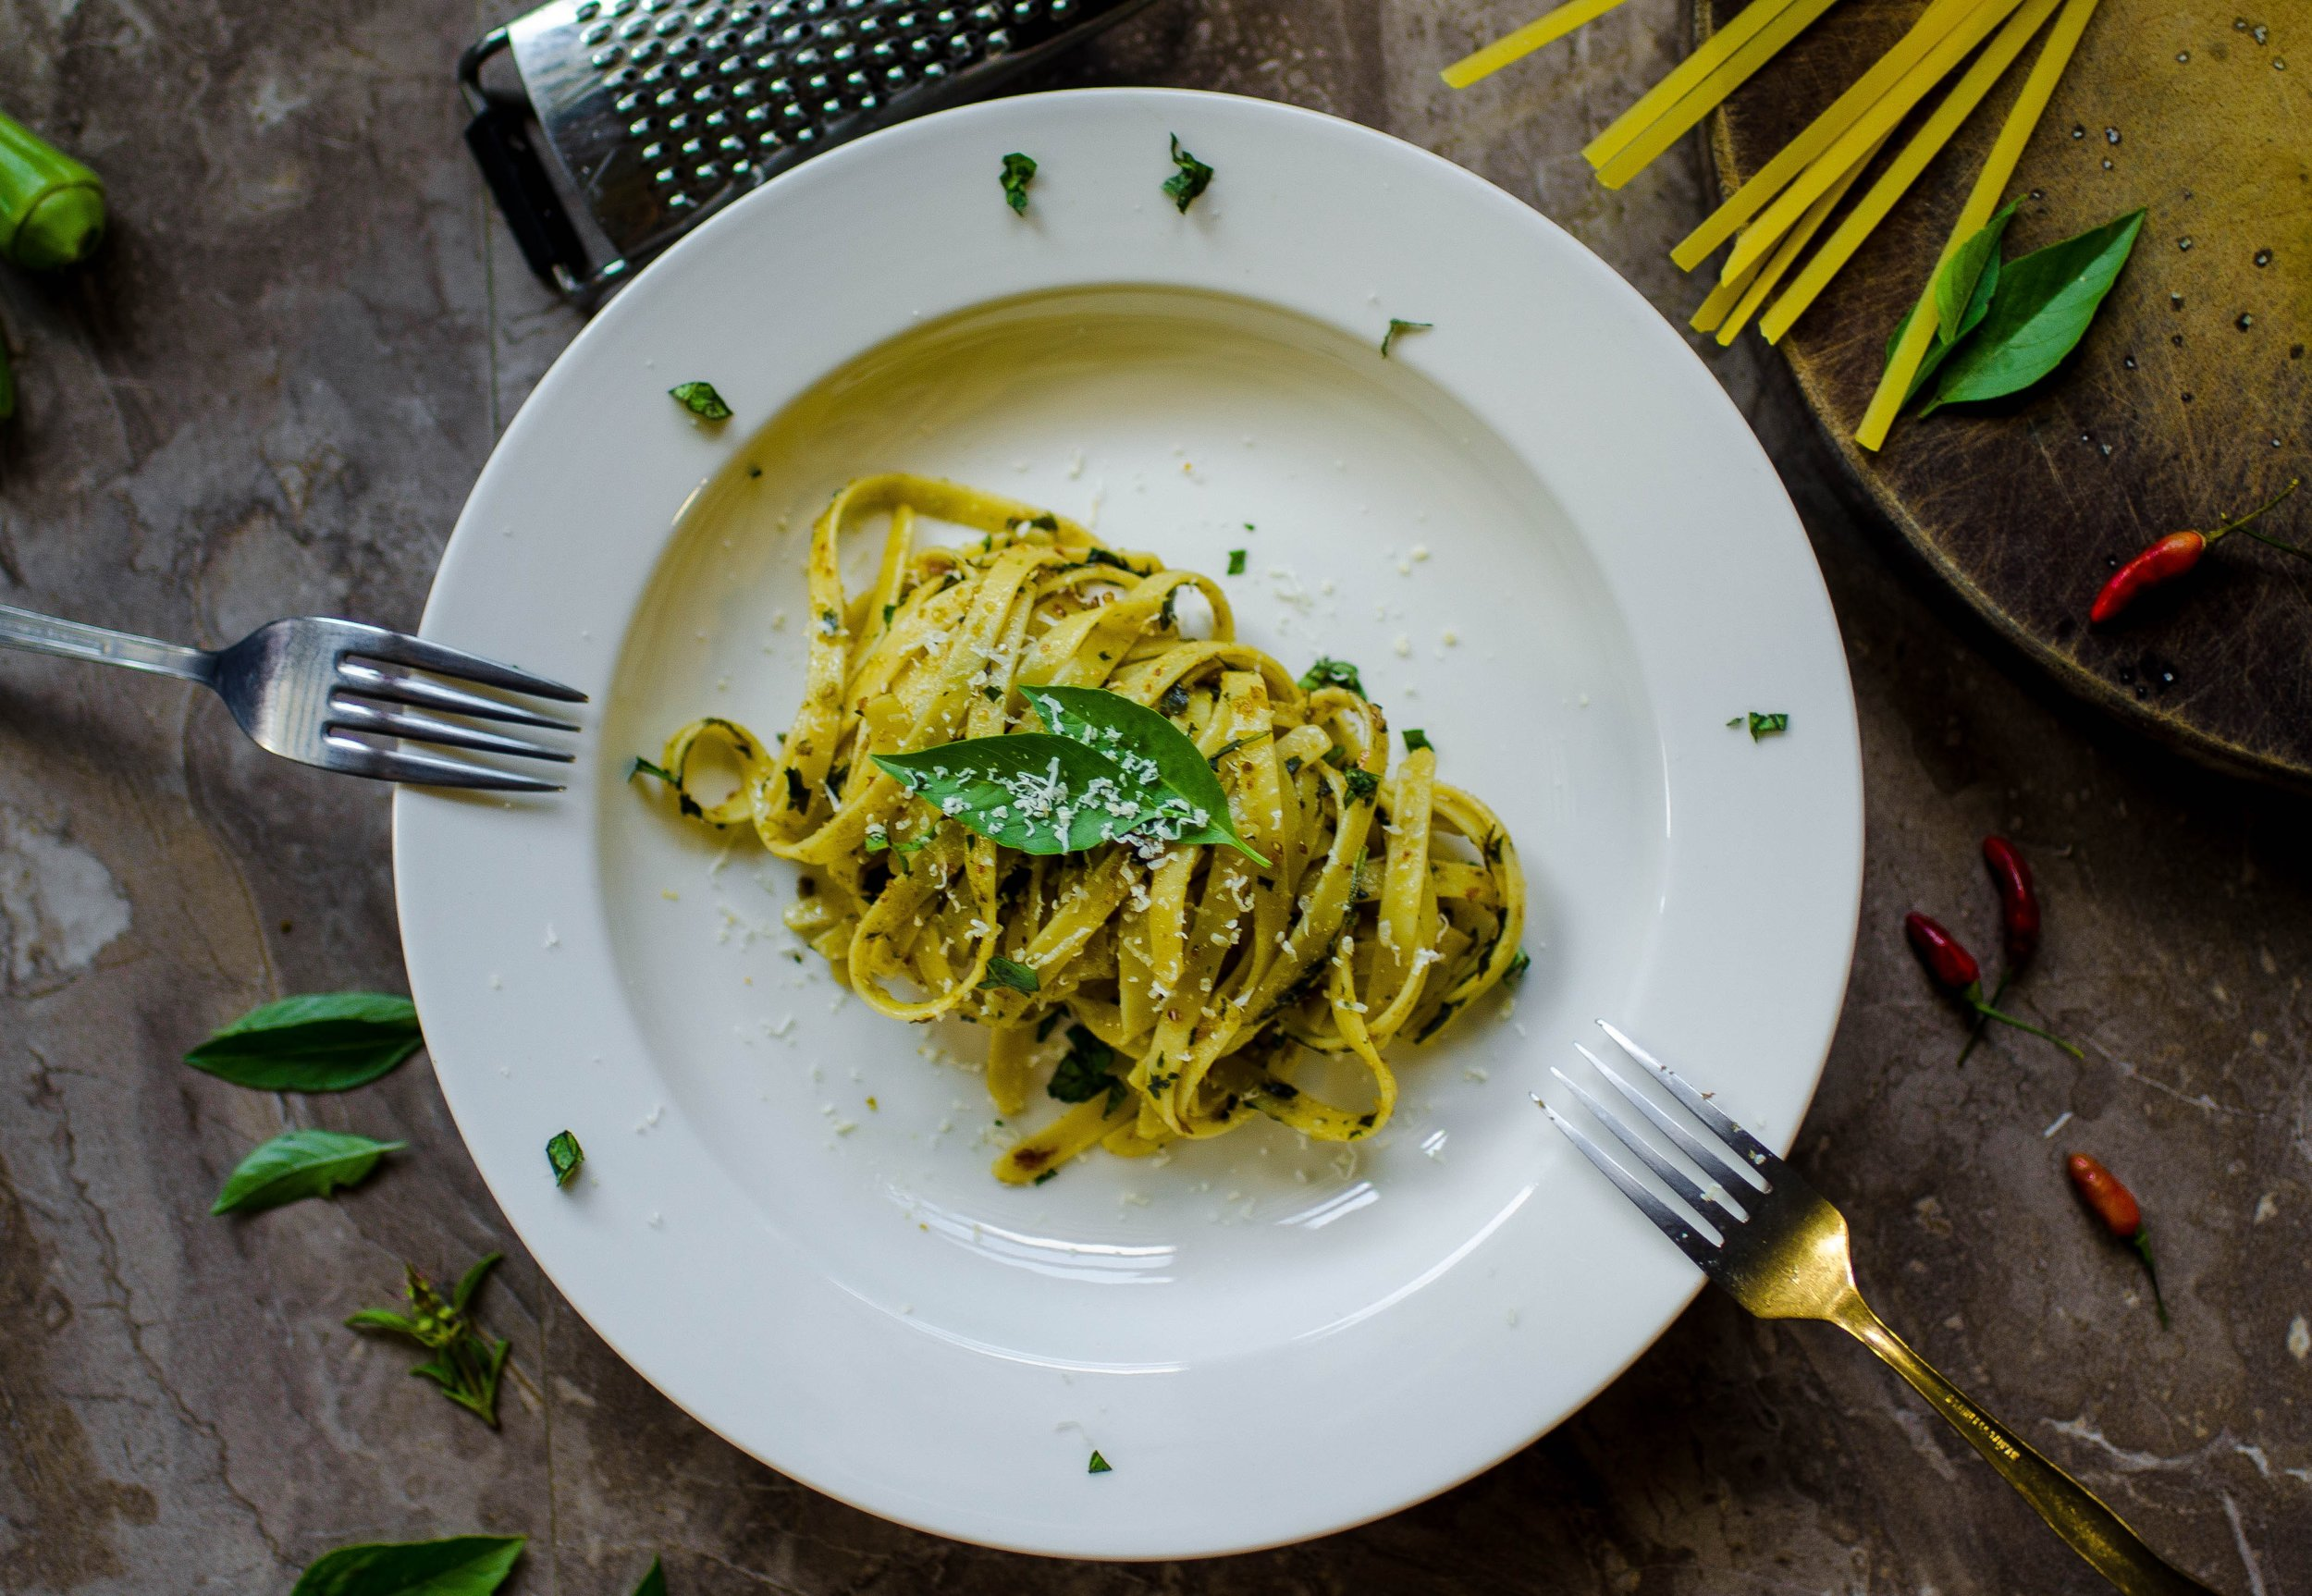 cuisine-cutlery-delicious-1256875.jpg